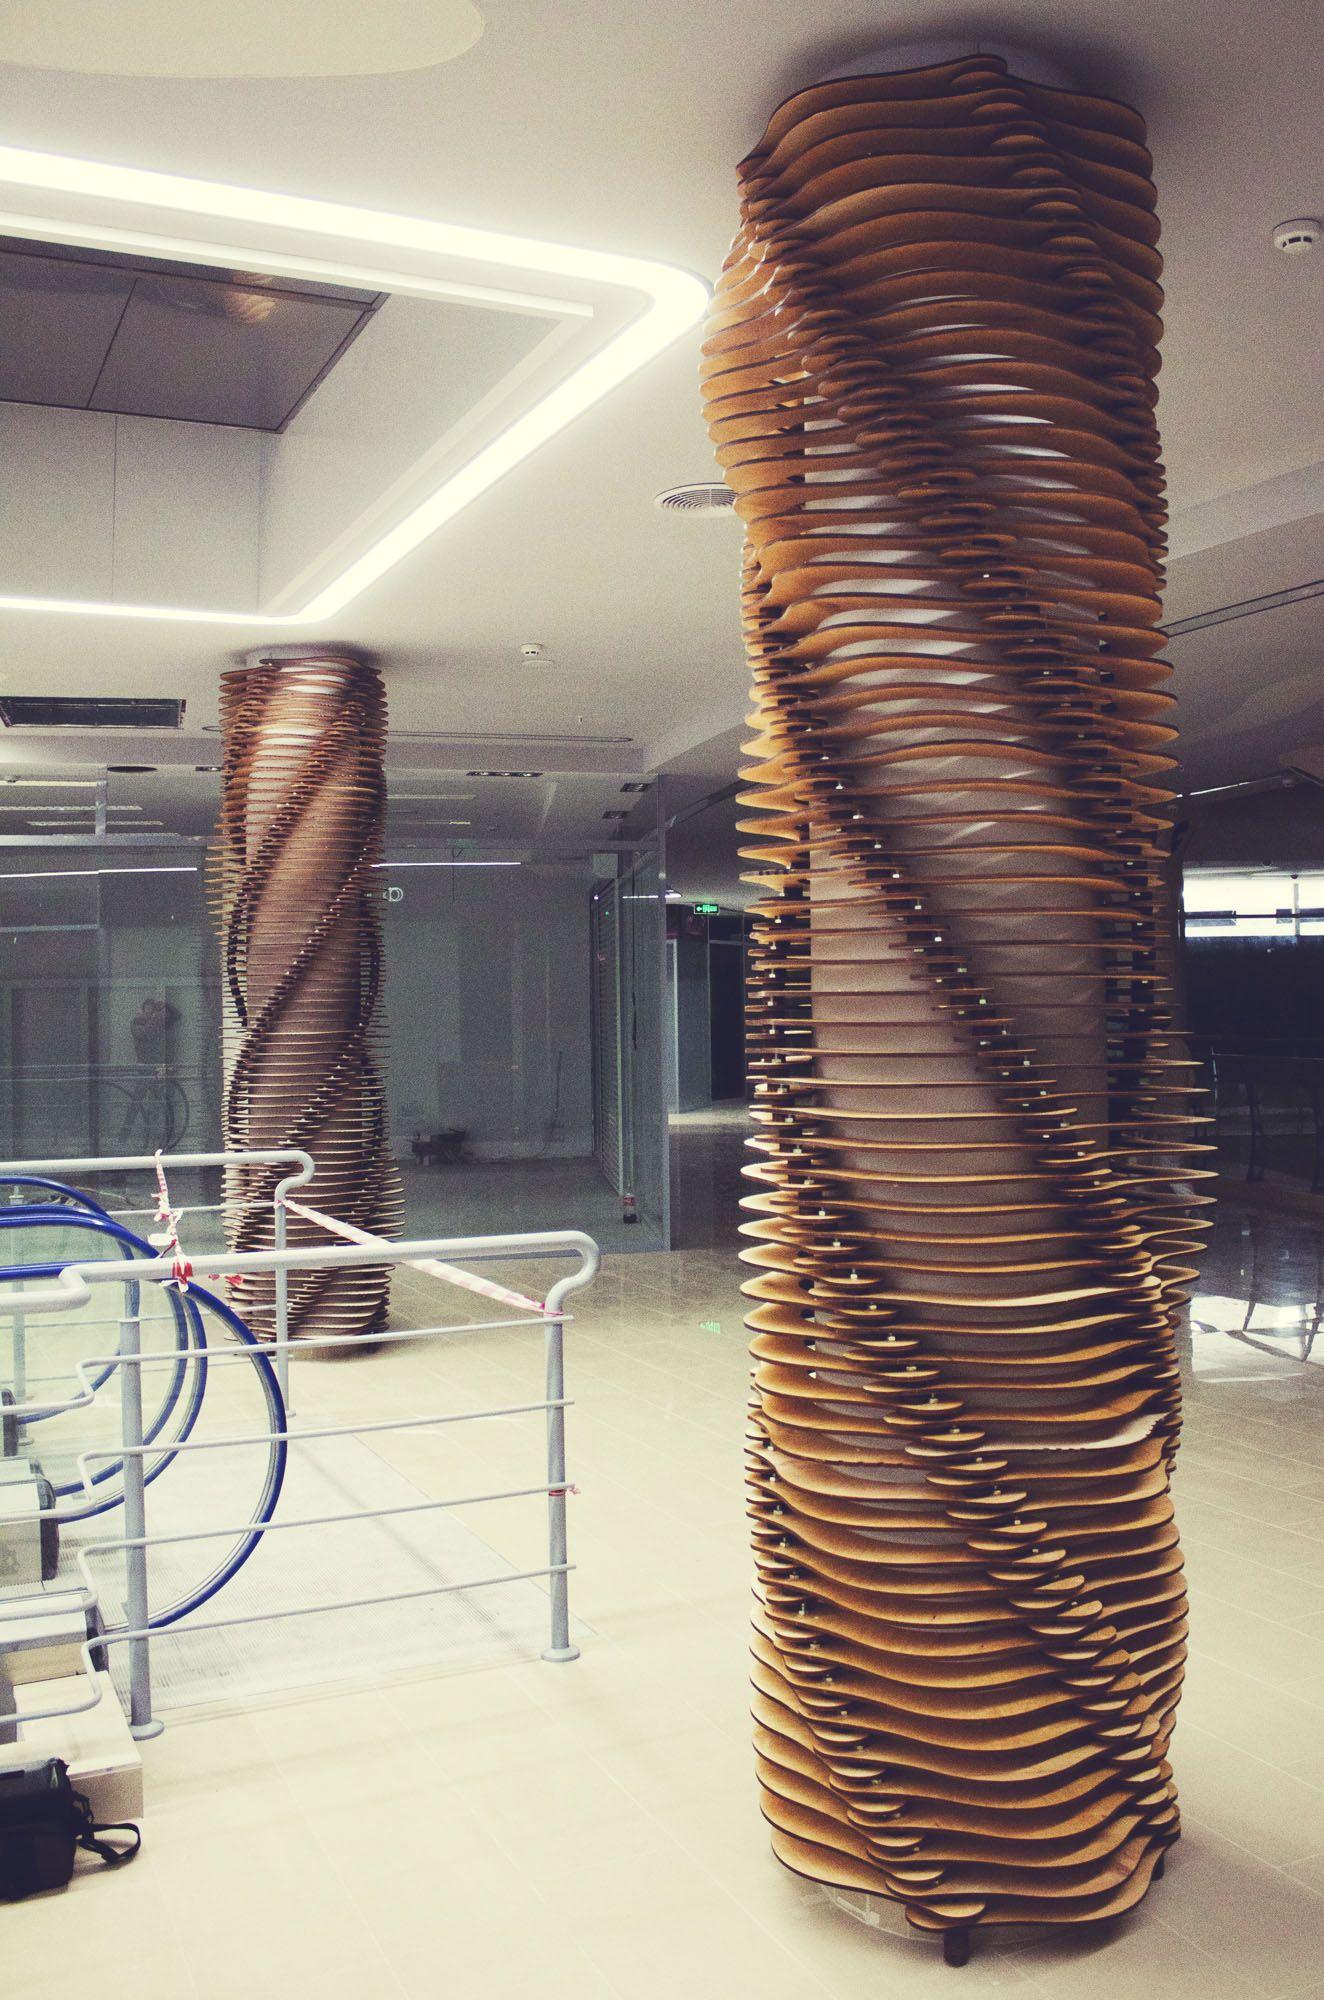 Column treatment design charrette image cards pillar - Decorative columns interior ideas ...